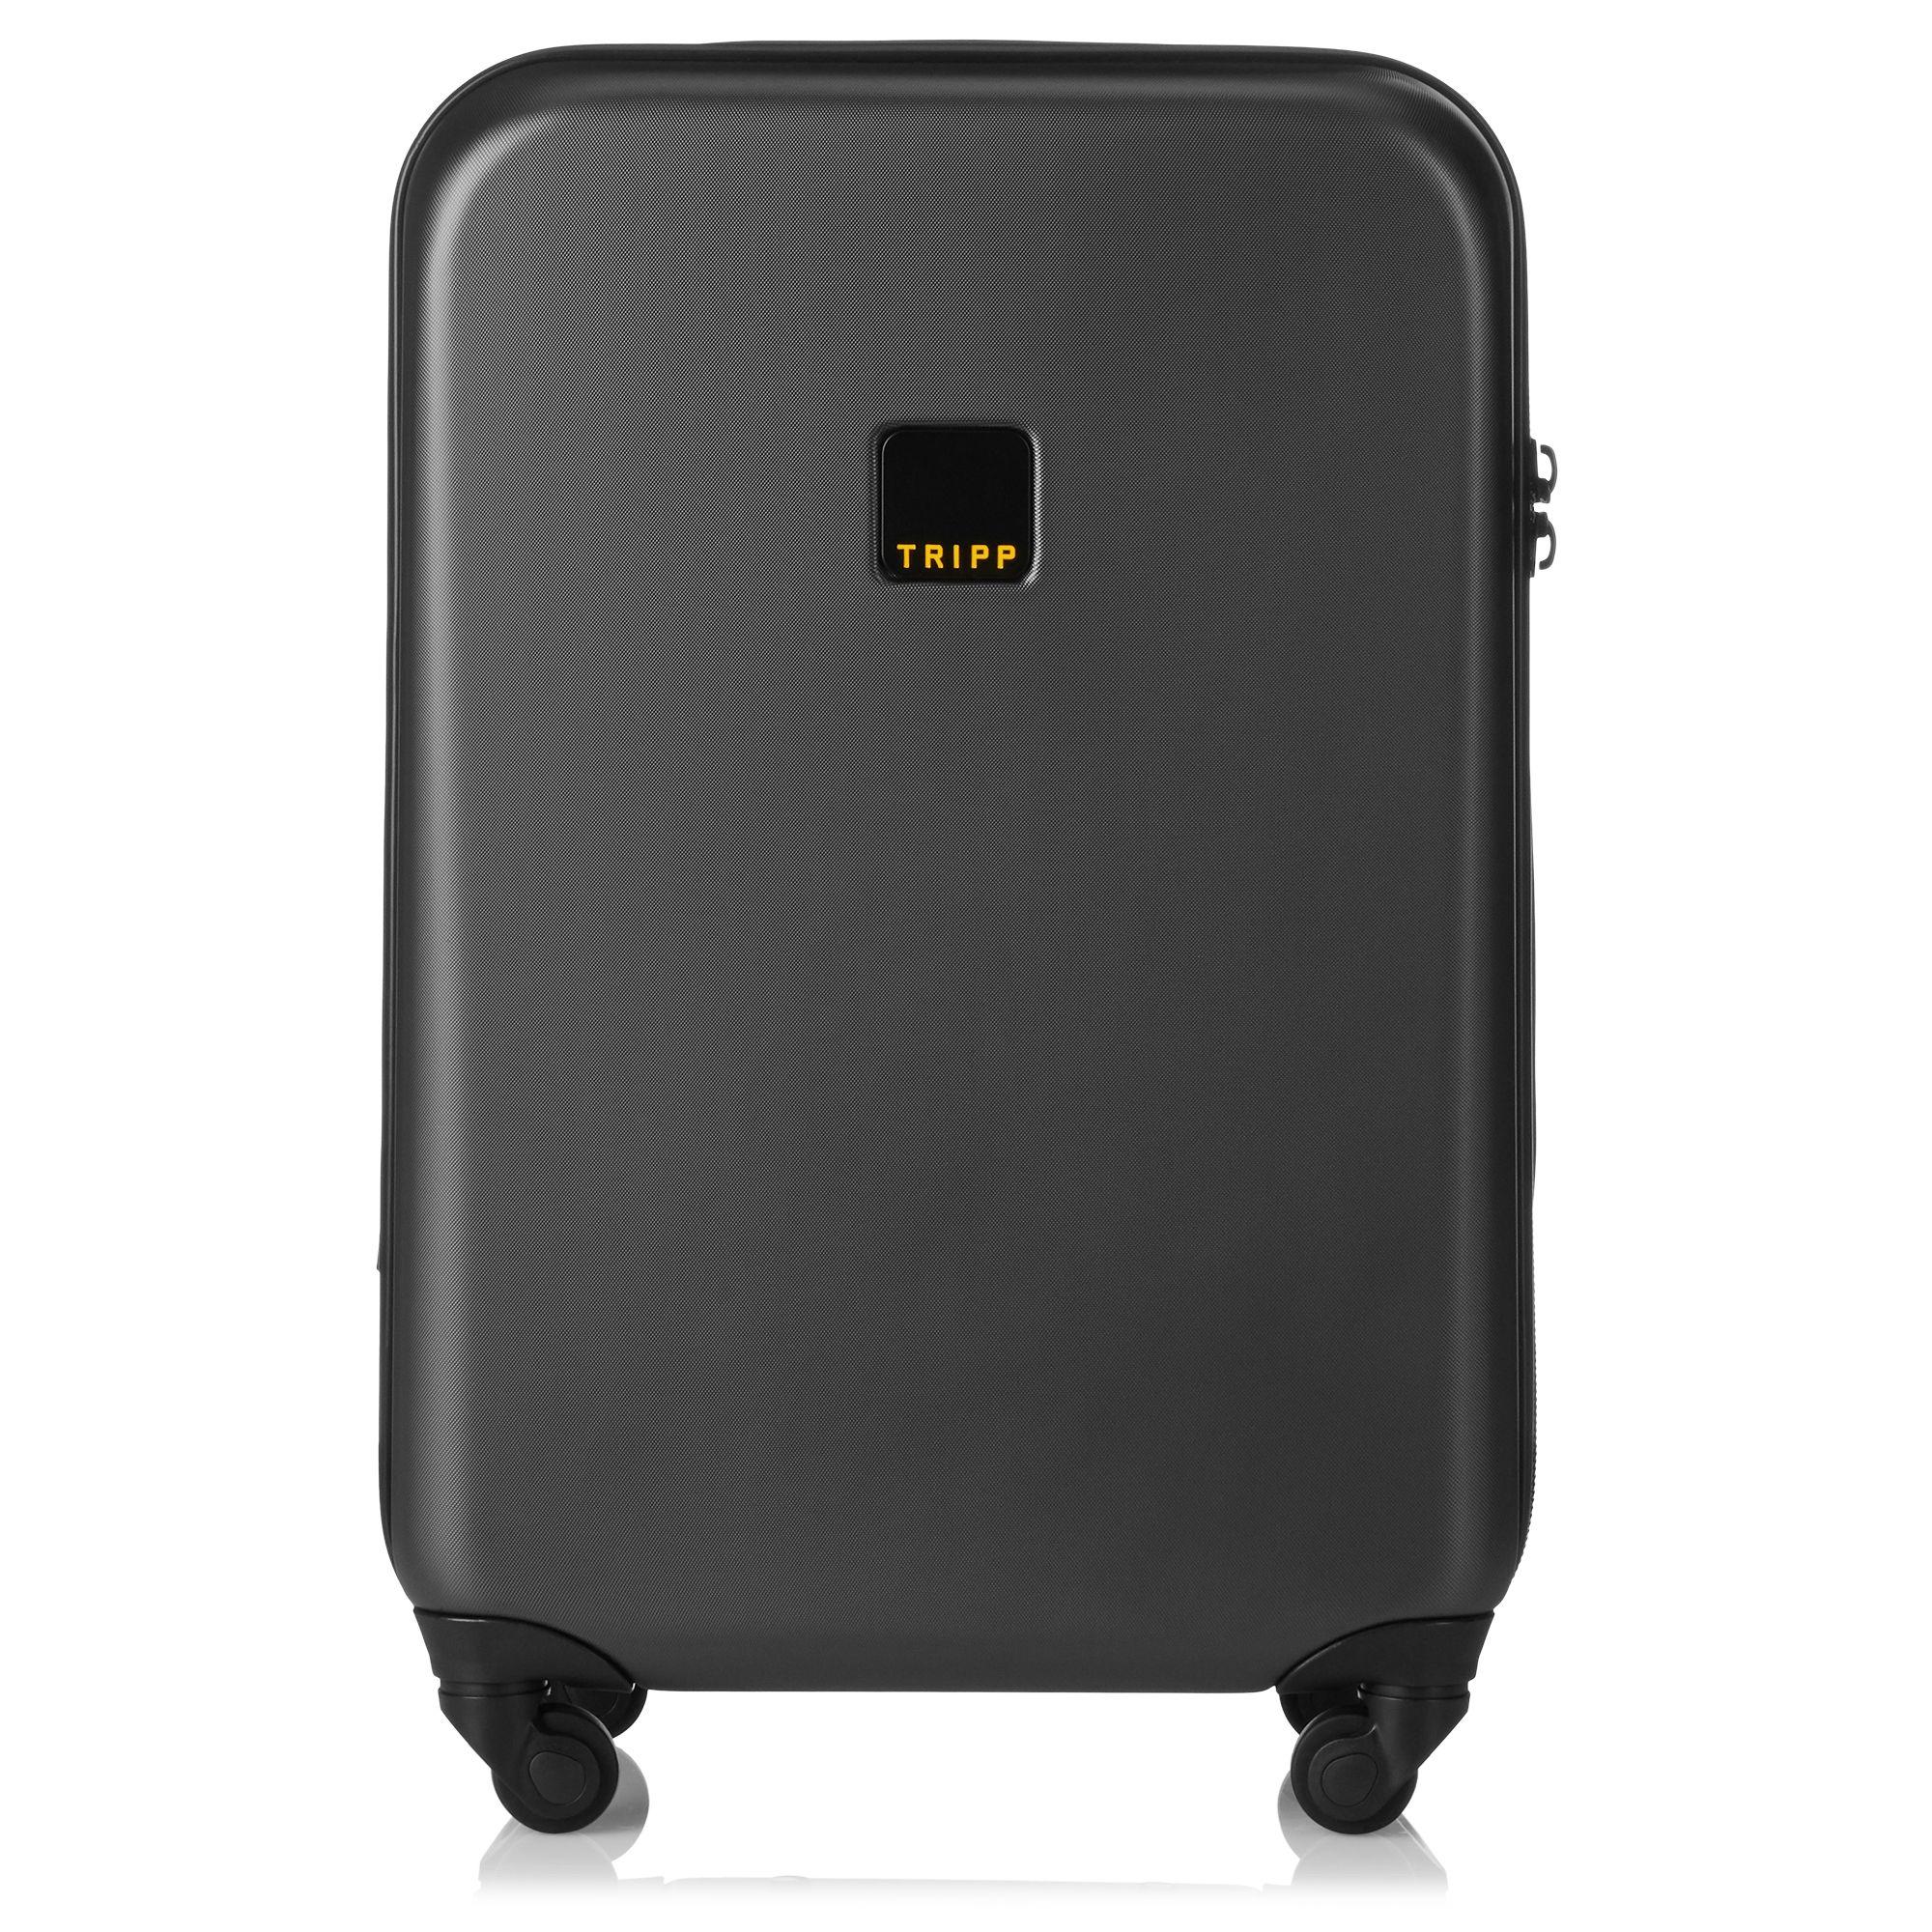 tripp graphite 39 style lite hard 39 cabin 4w case hard. Black Bedroom Furniture Sets. Home Design Ideas